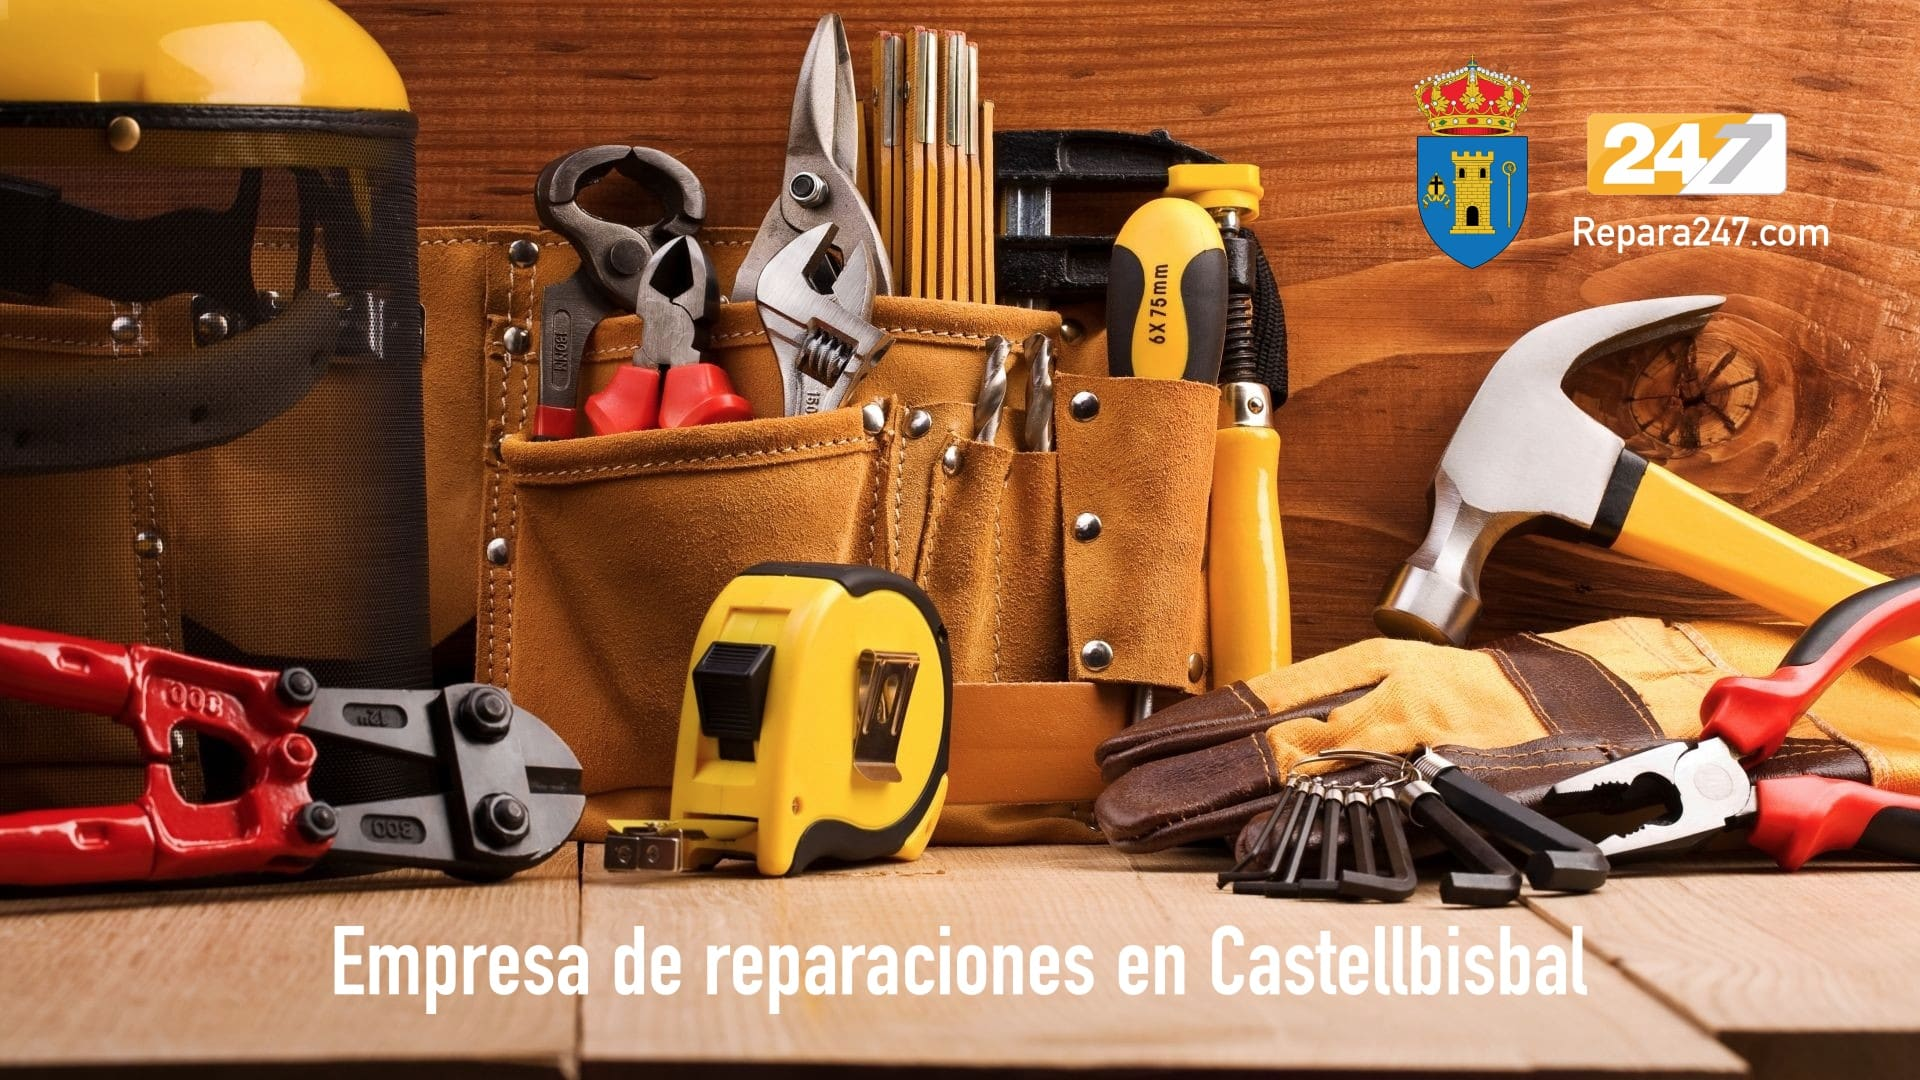 Empresa de reparaciones en Castellbisbal